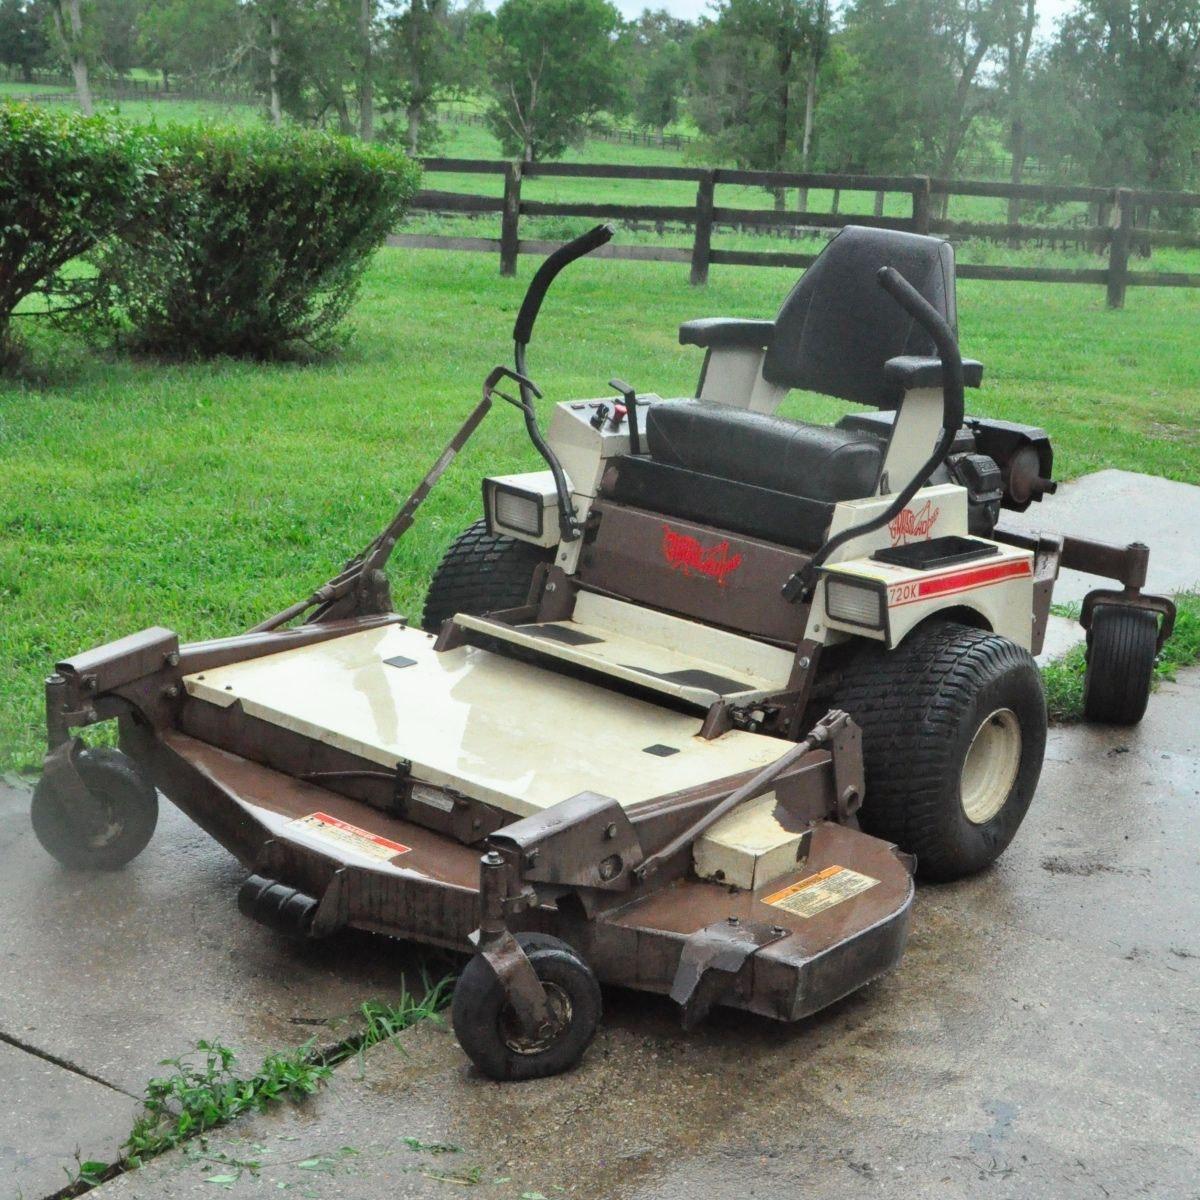 Grasshopper Zero Turn Riding Lawn Mower